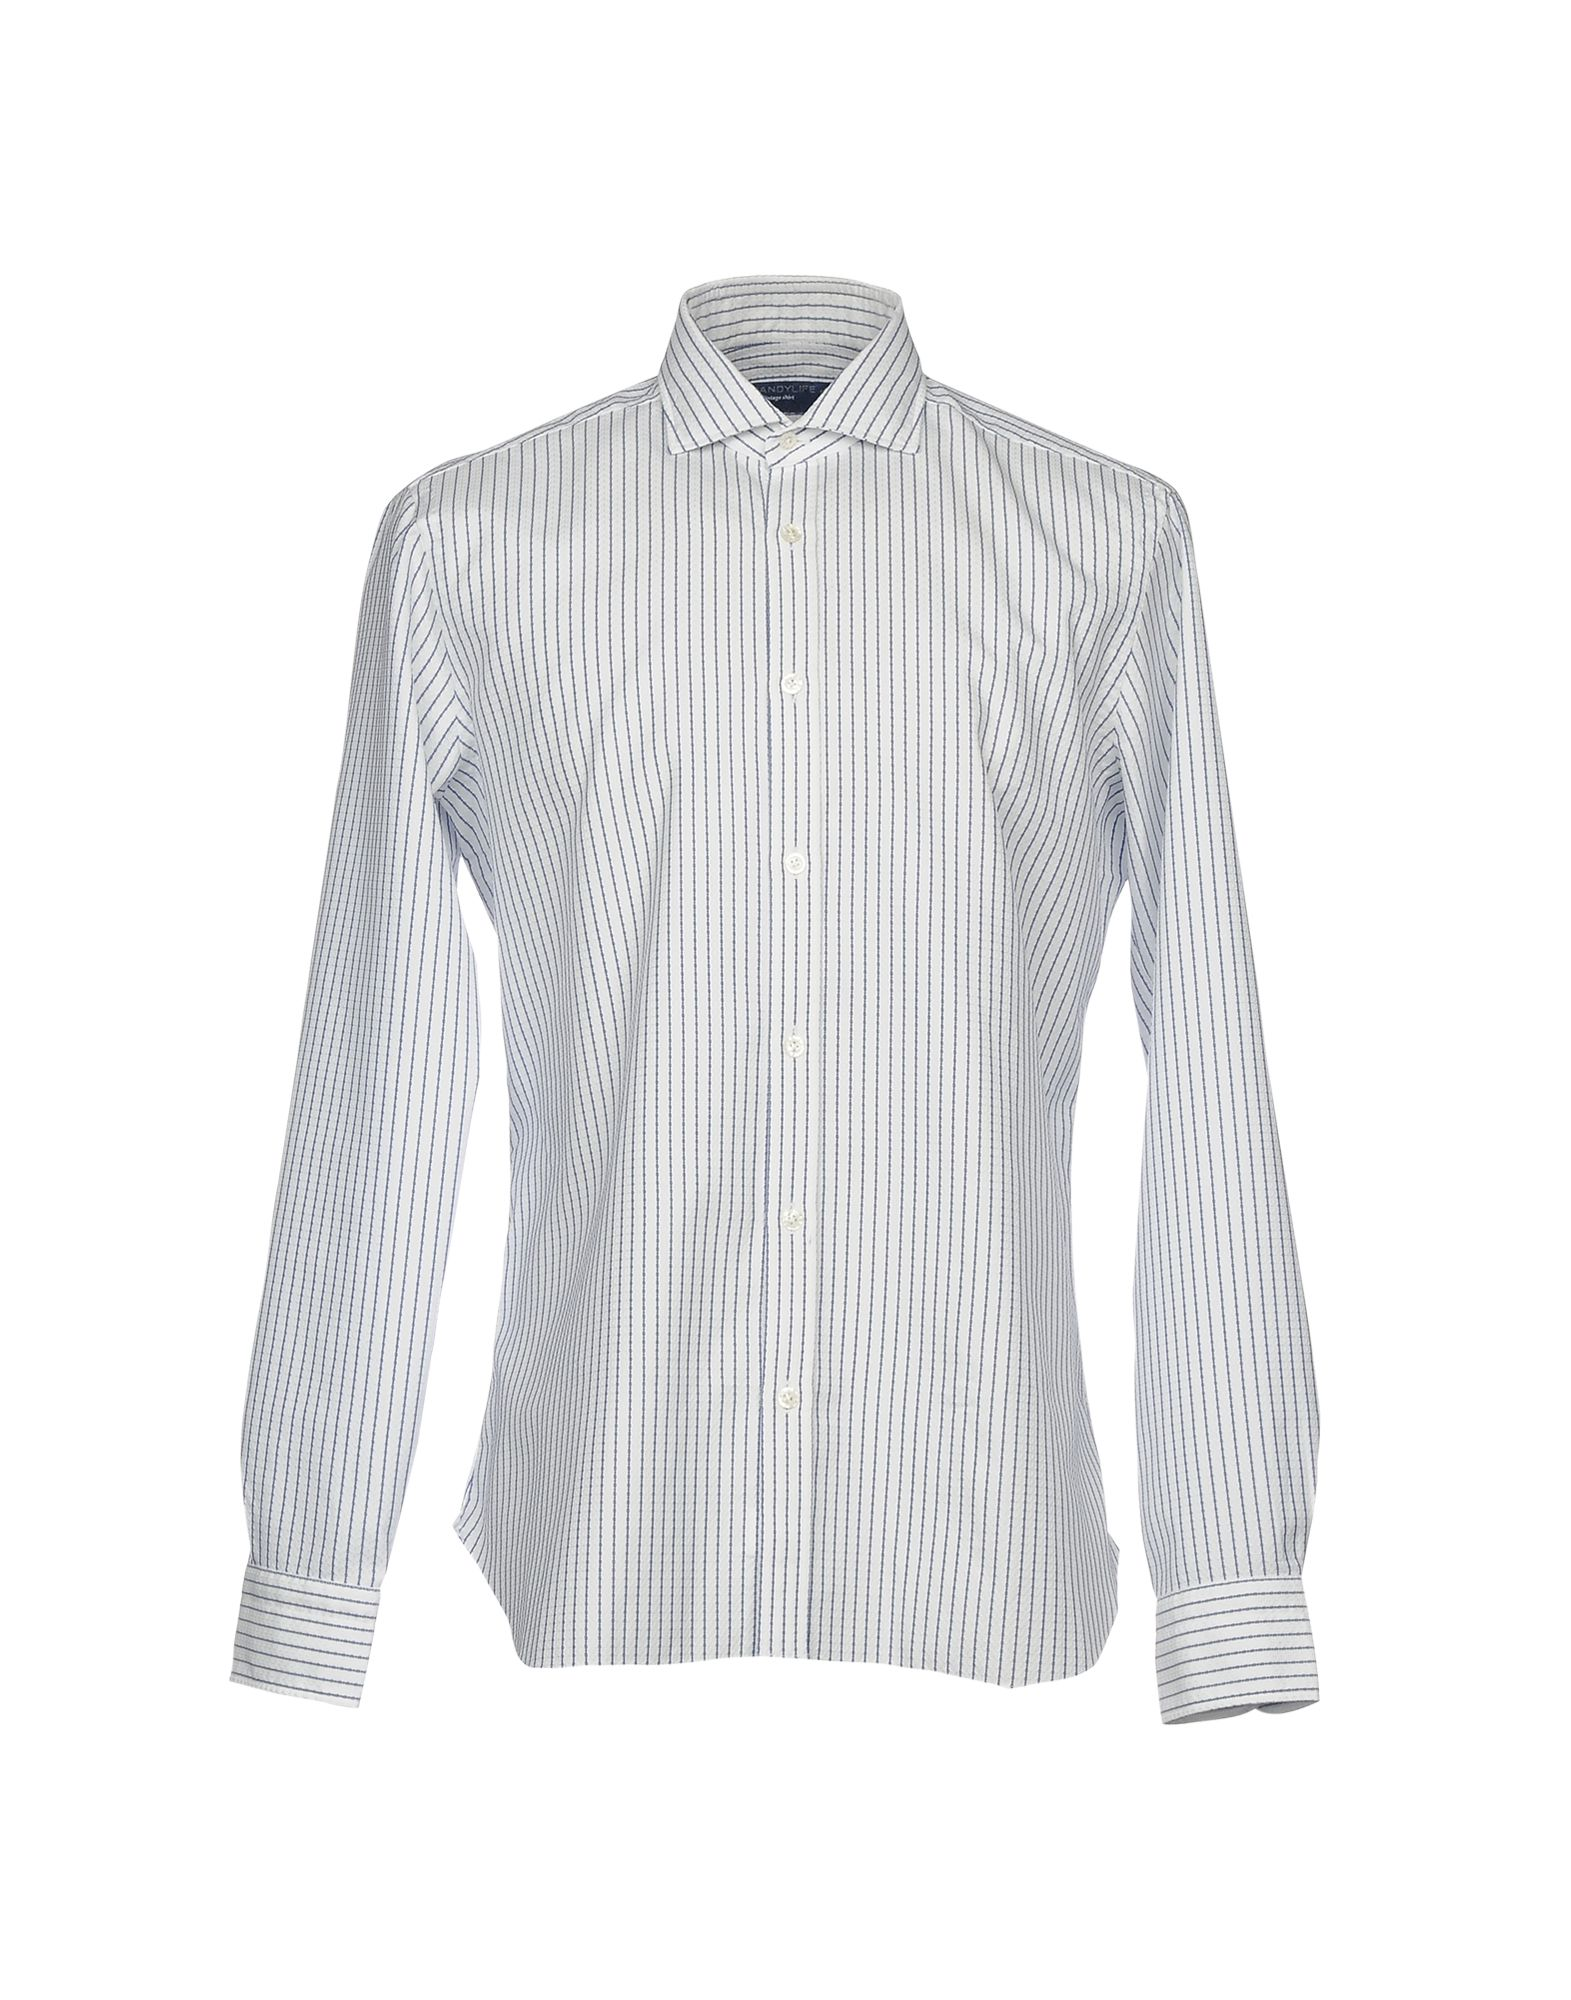 Camicia A Righe Dandylife By Barba Uomo - Acquista online su